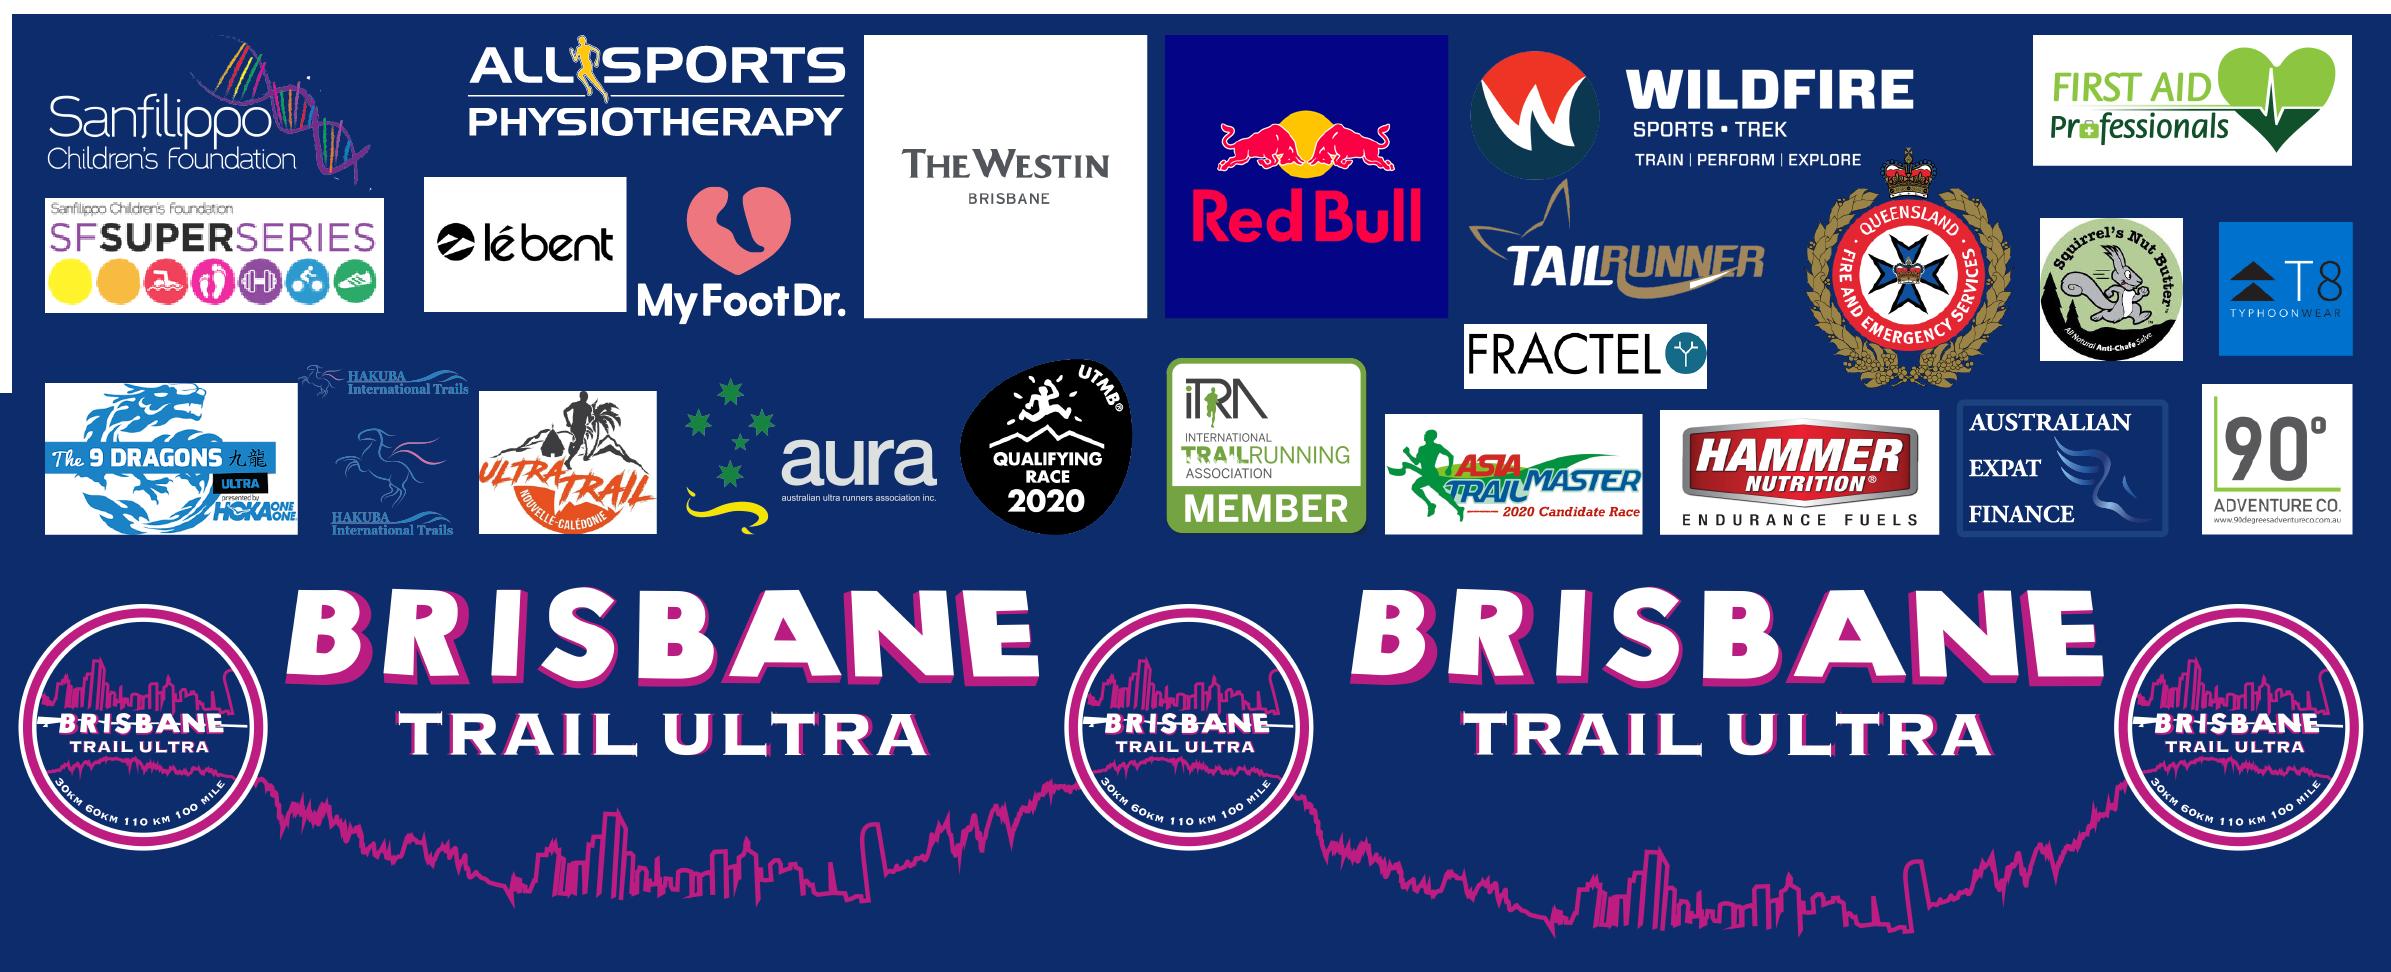 Brisbane Trail Ultra Email Sponsors.png